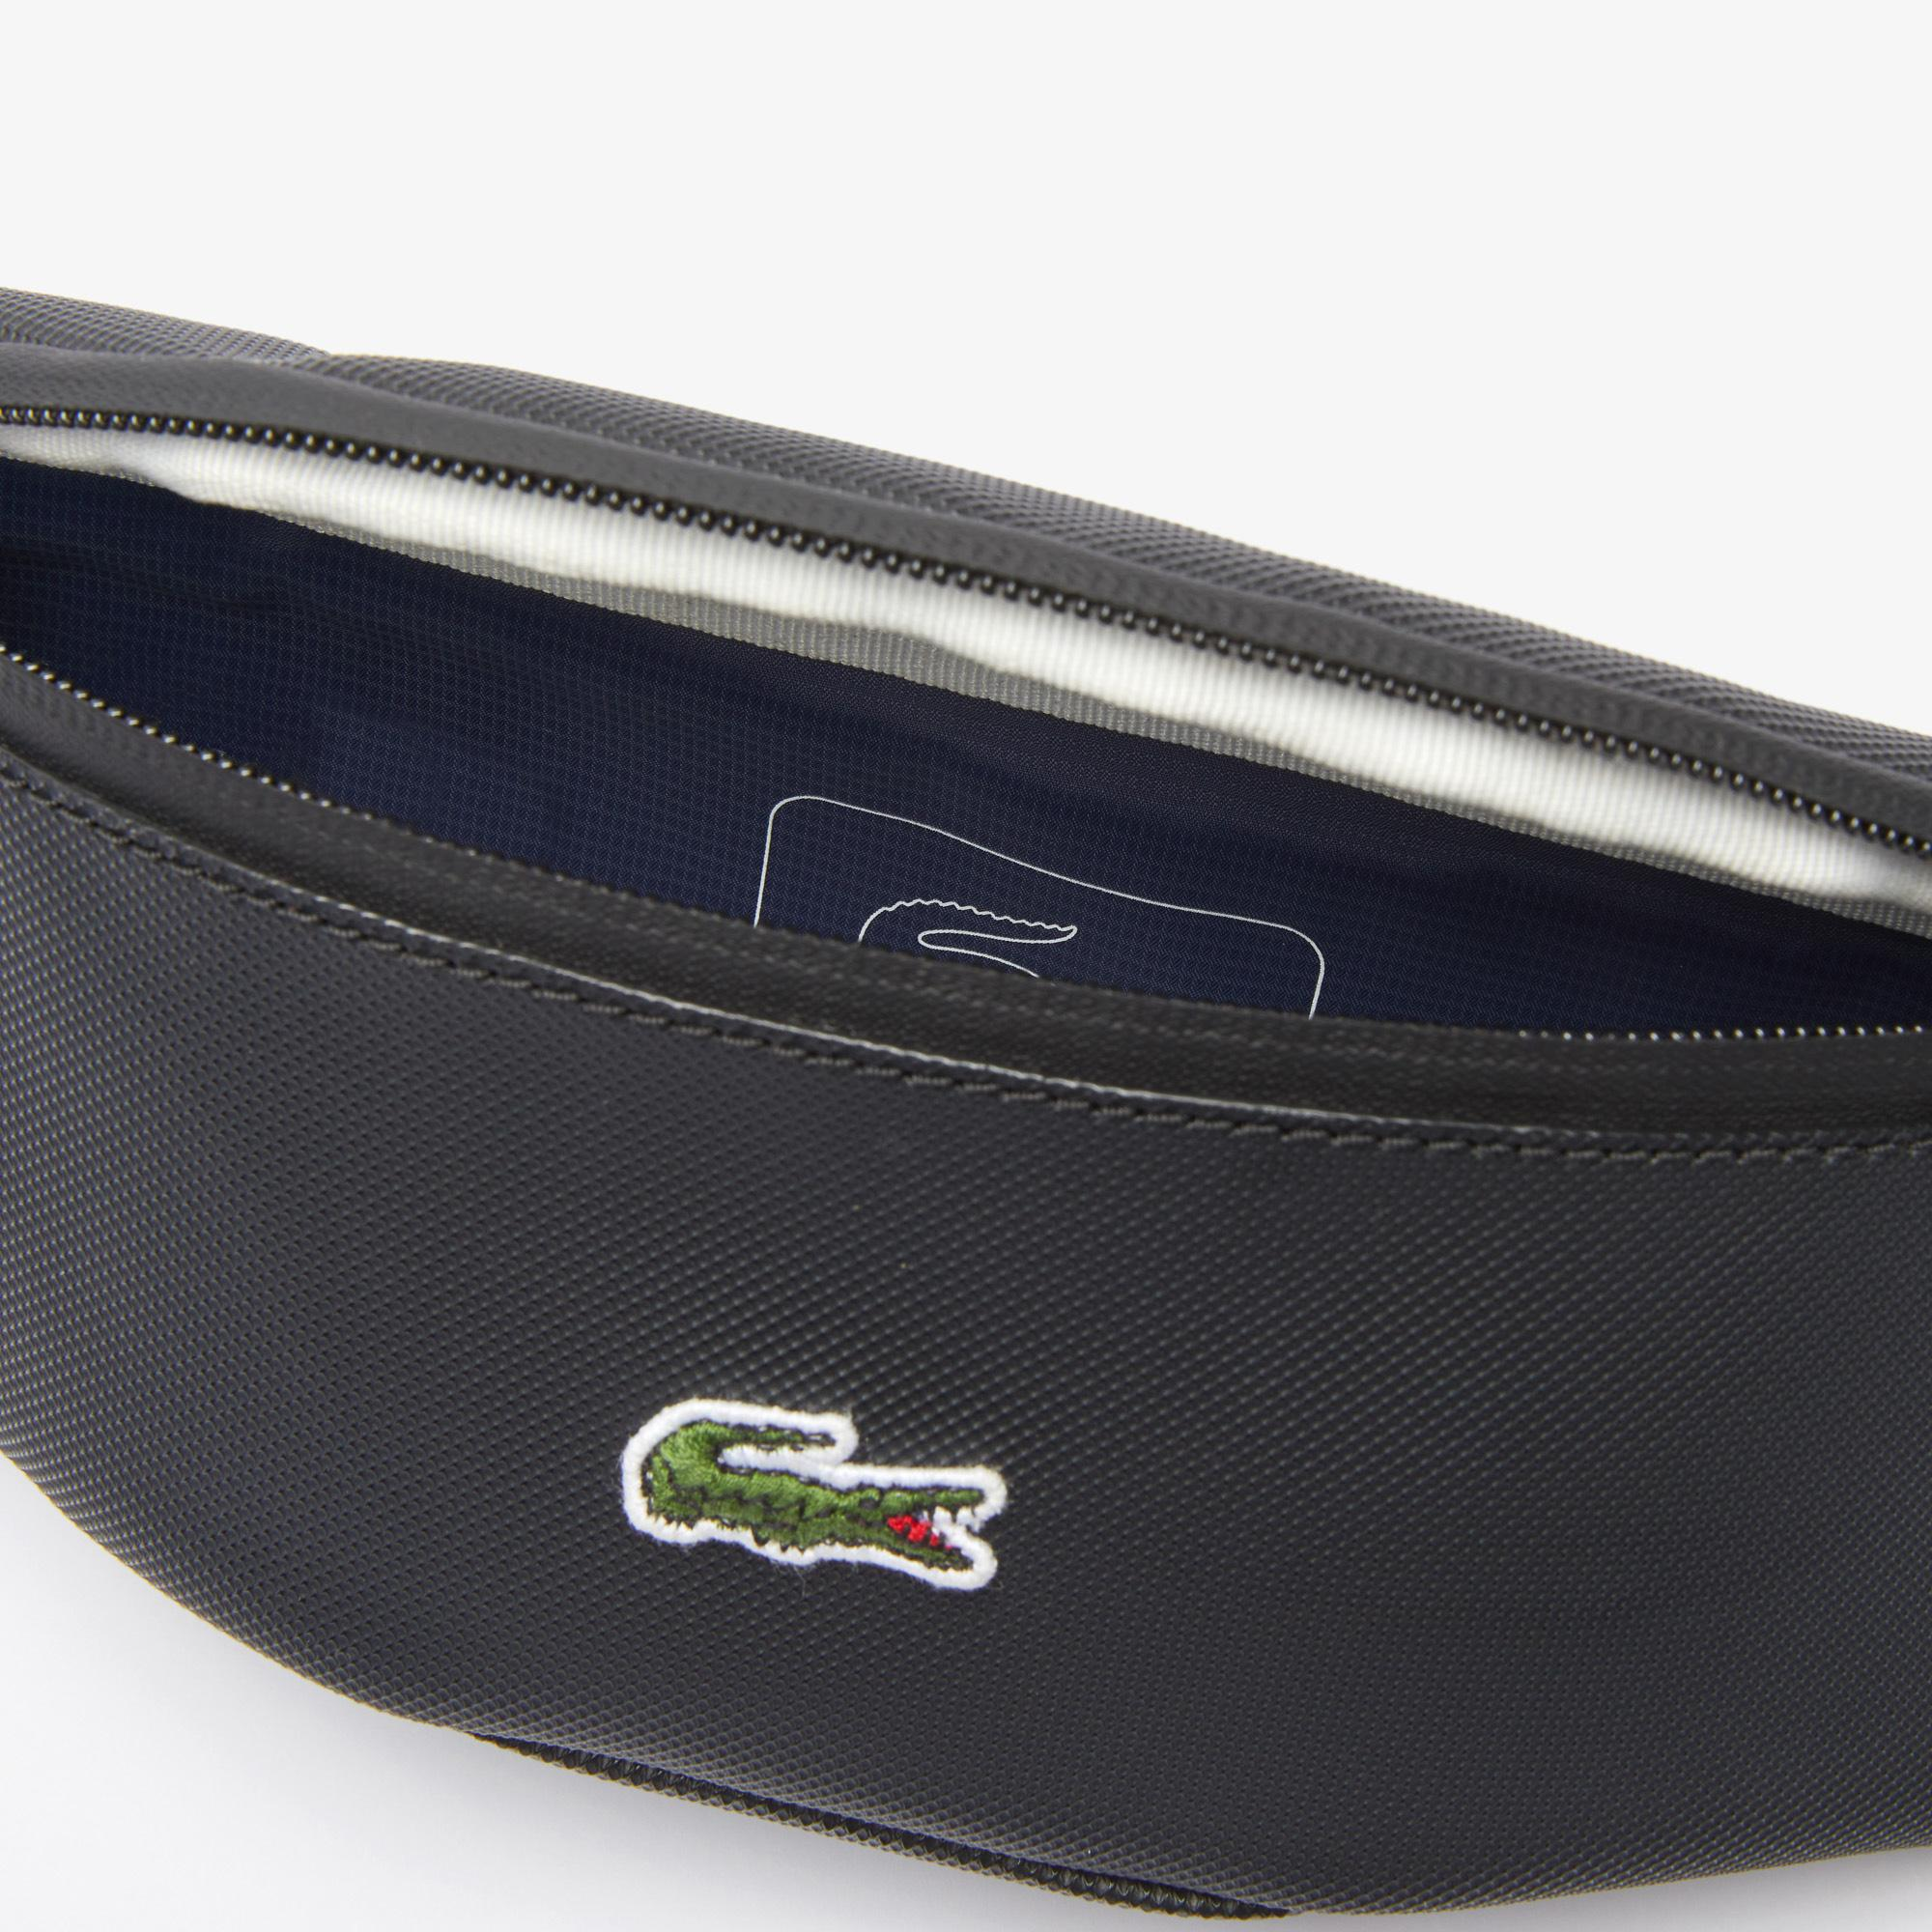 Lacoste сумка чоловіча Access Premium шкіряна